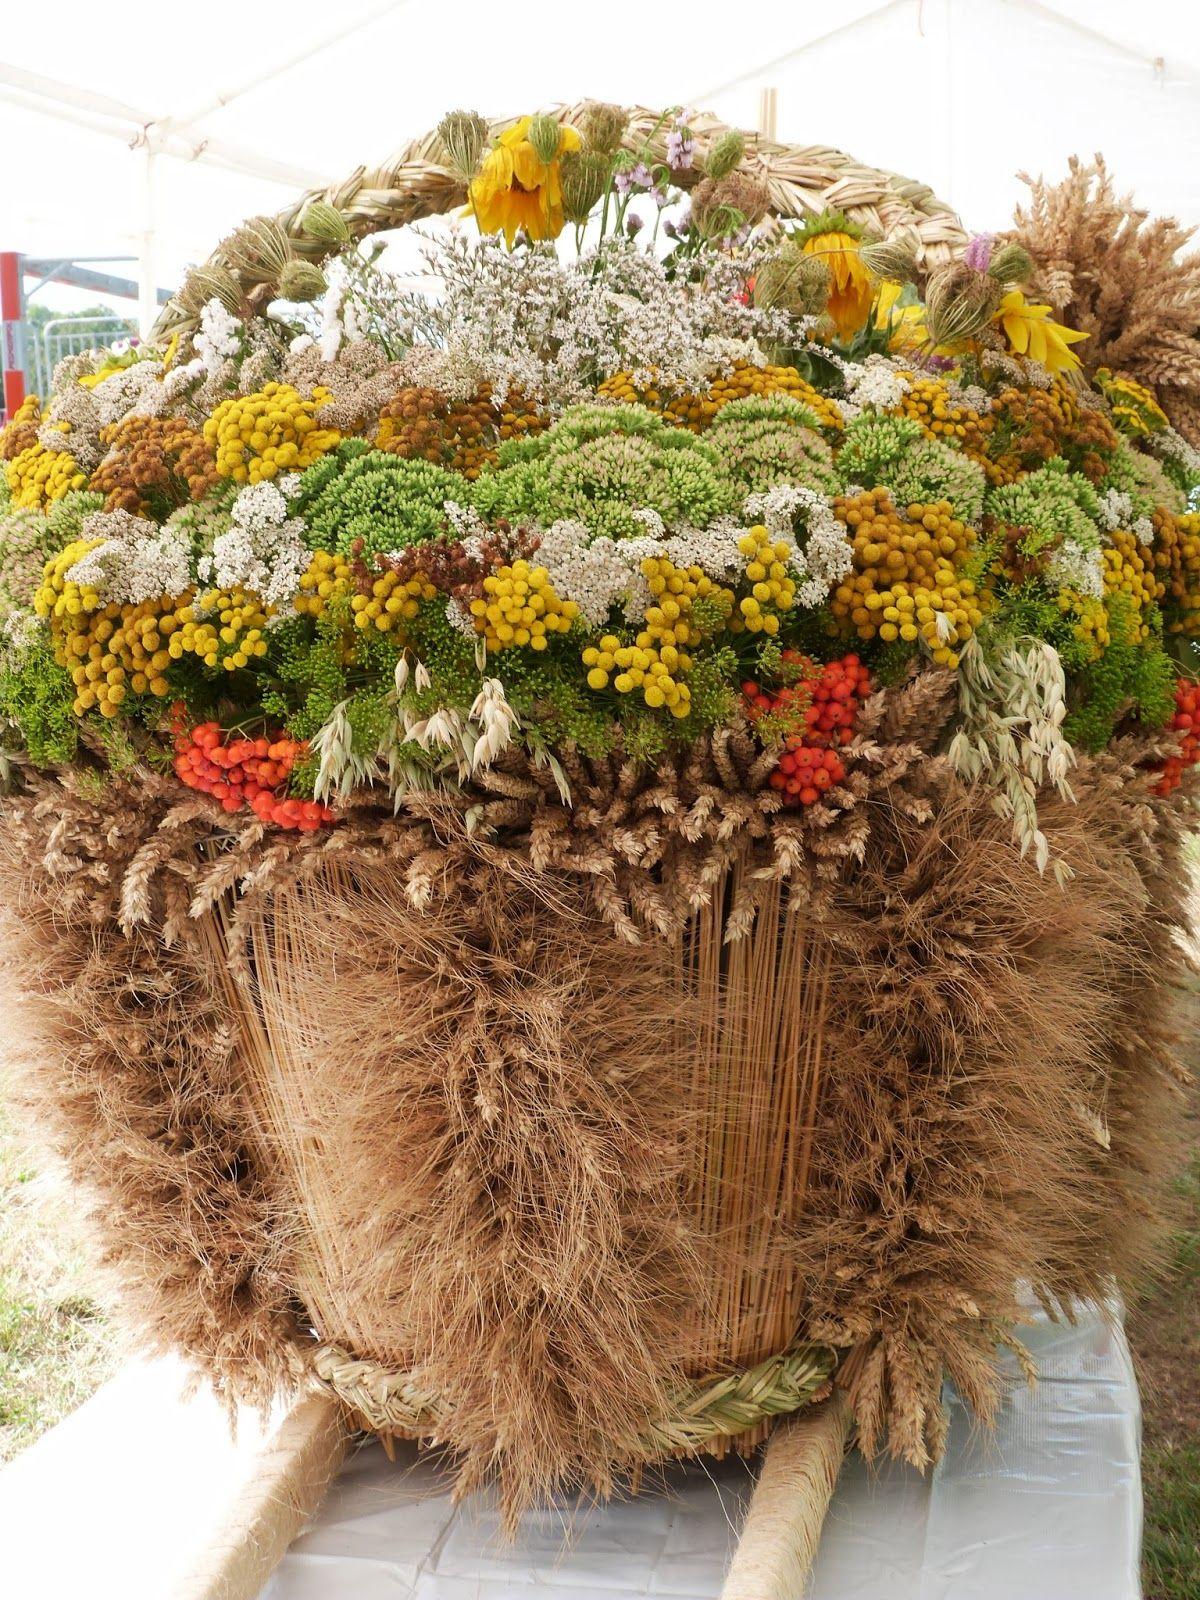 Pin By Jolanta Gorzynska On Dozynki Fall Wreath Wreaths Plants